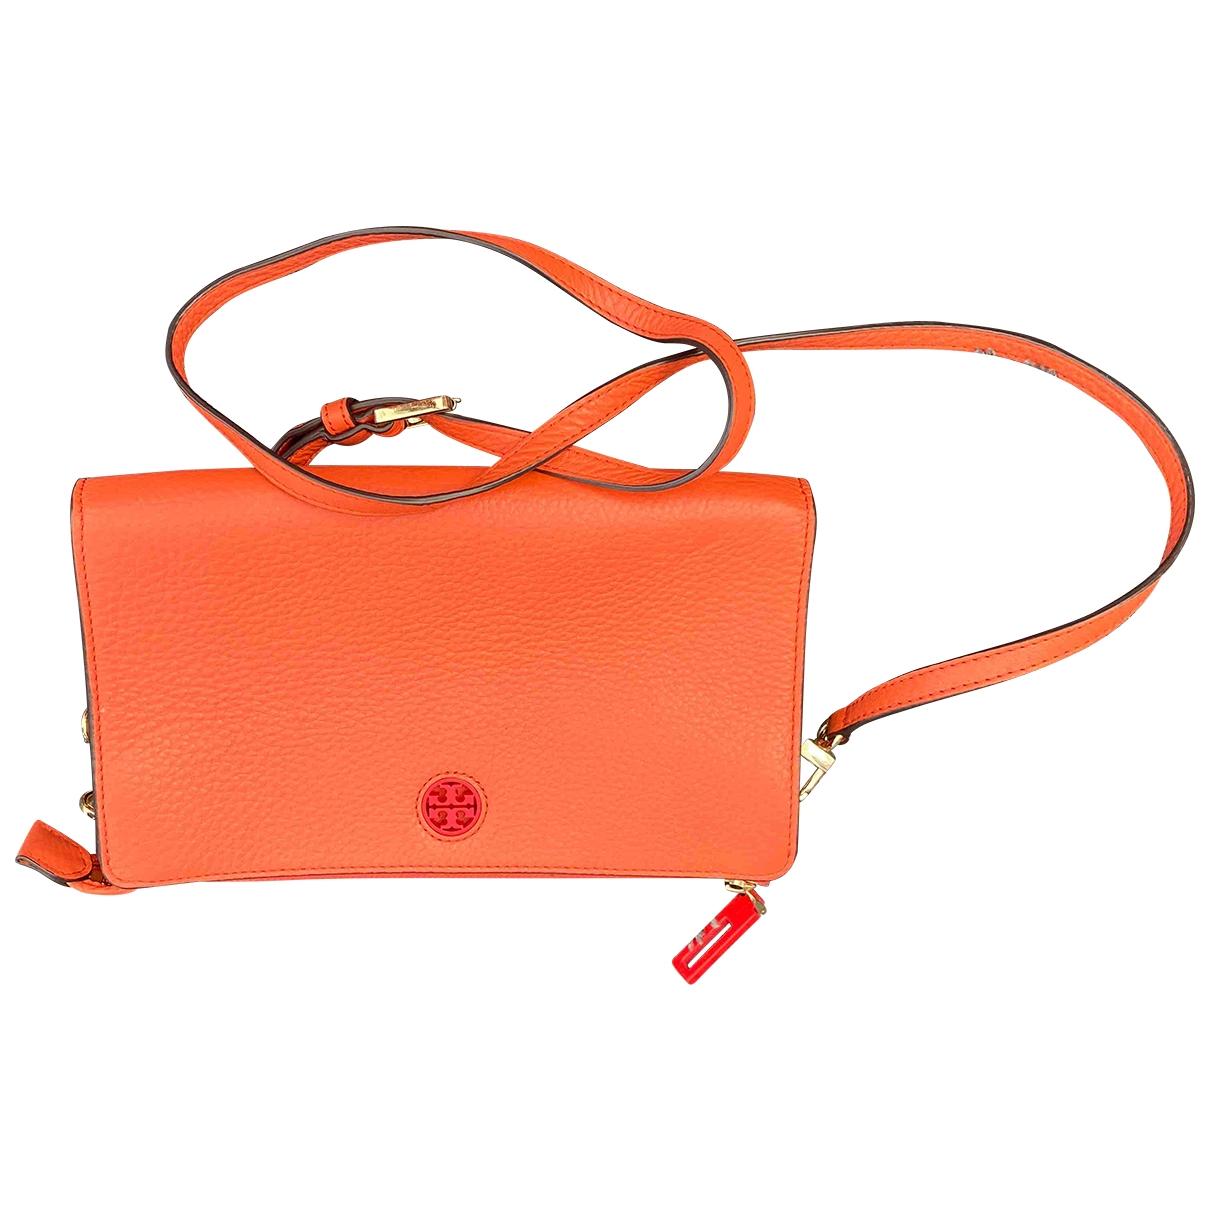 Tory Burch \N Clutch in  Orange Leder